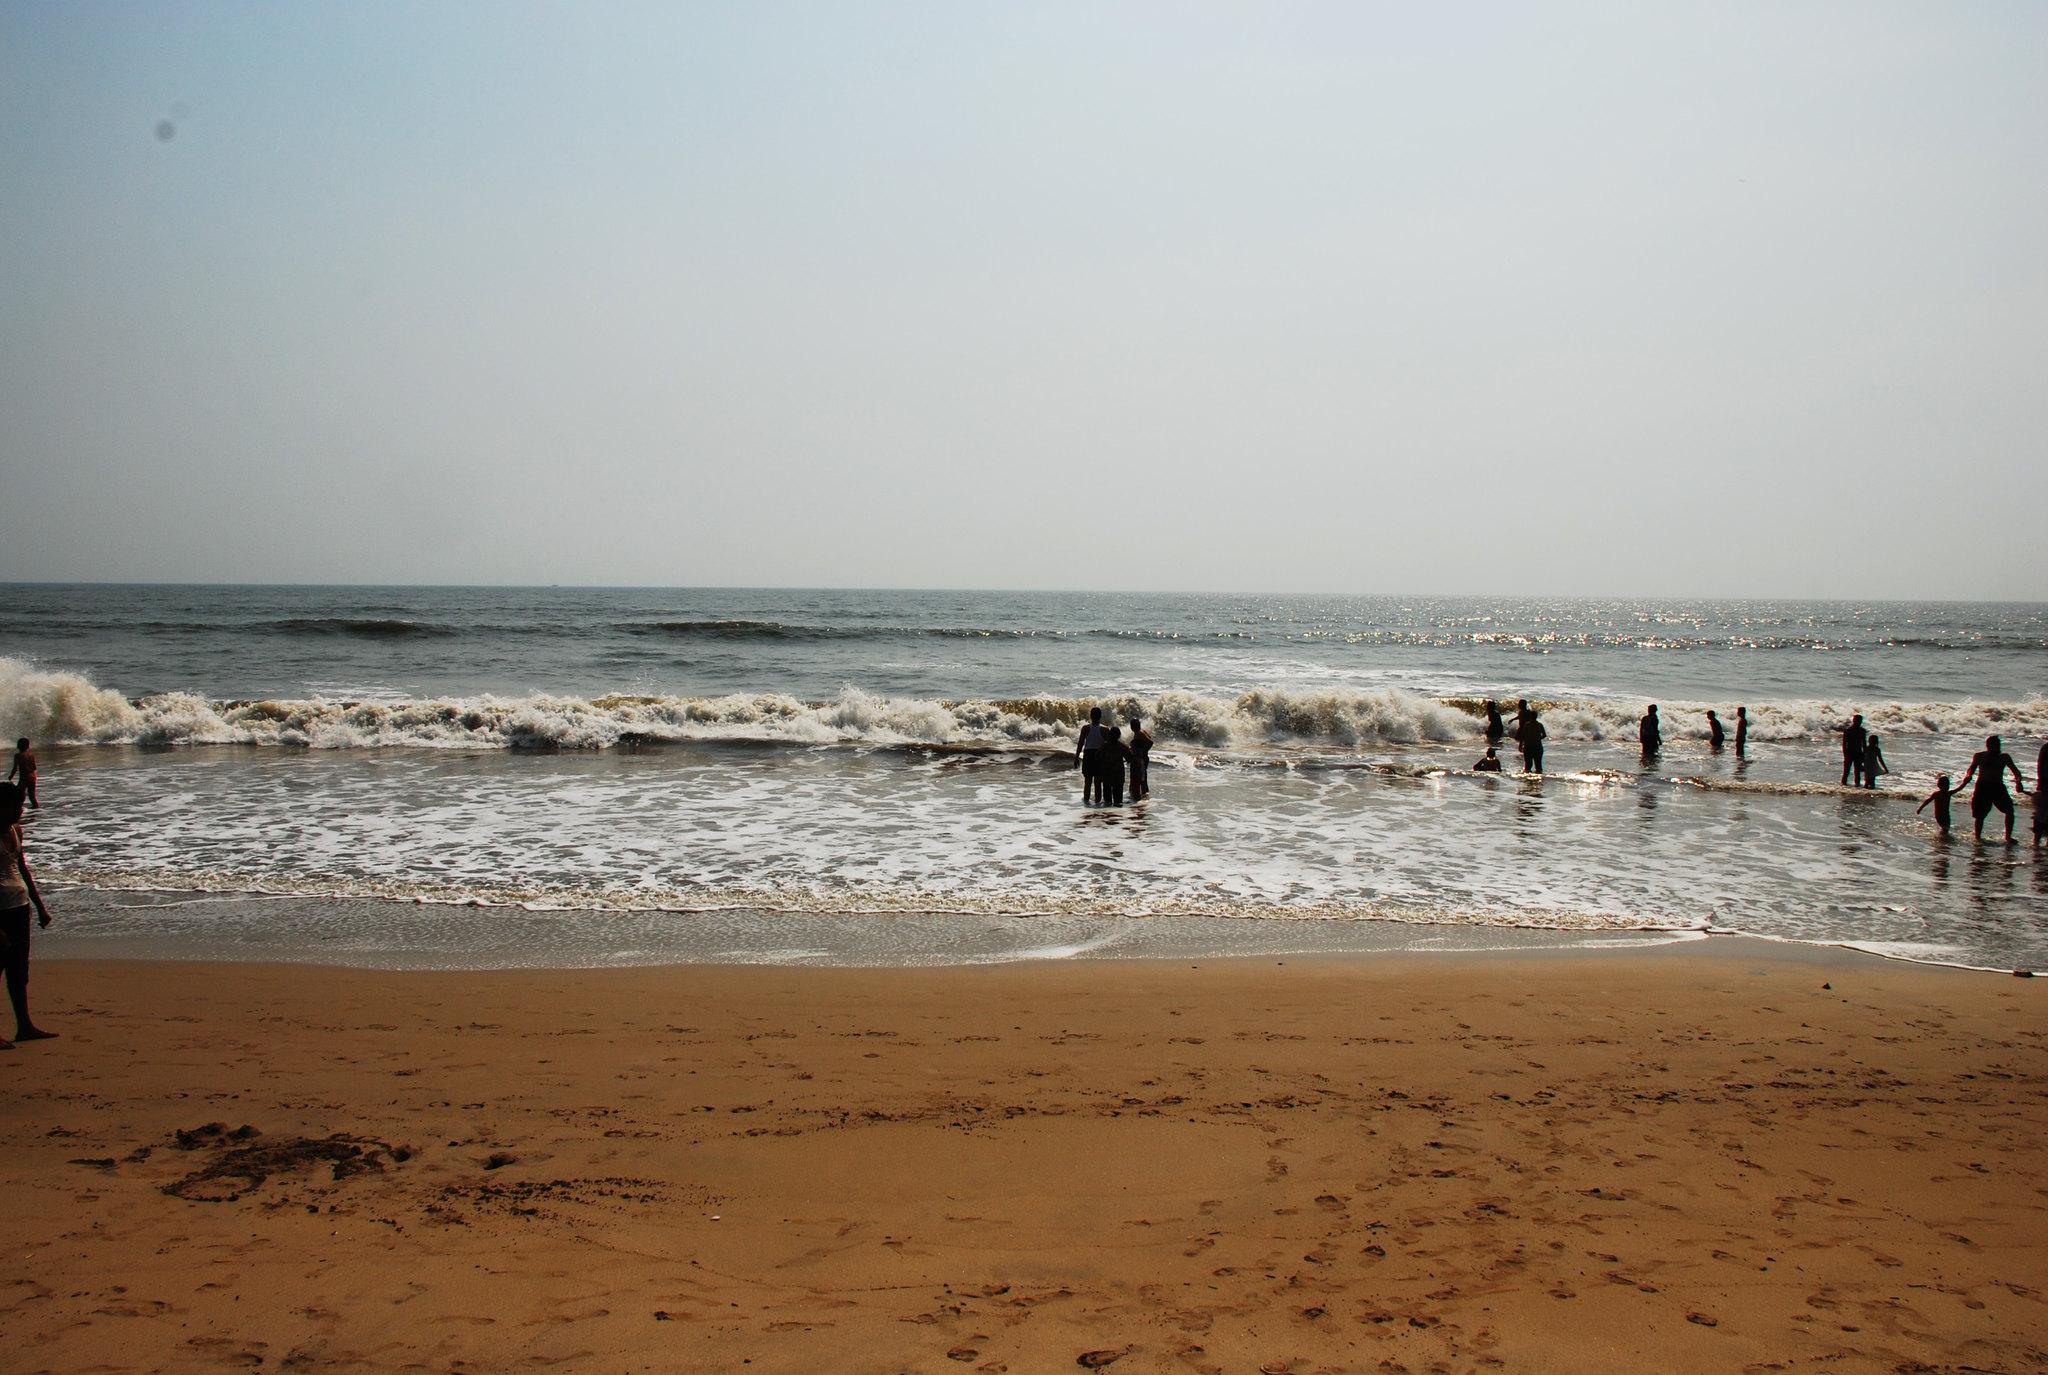 Kashid Beach-Amazing Beach in the Konkan Coast of Maharashtra